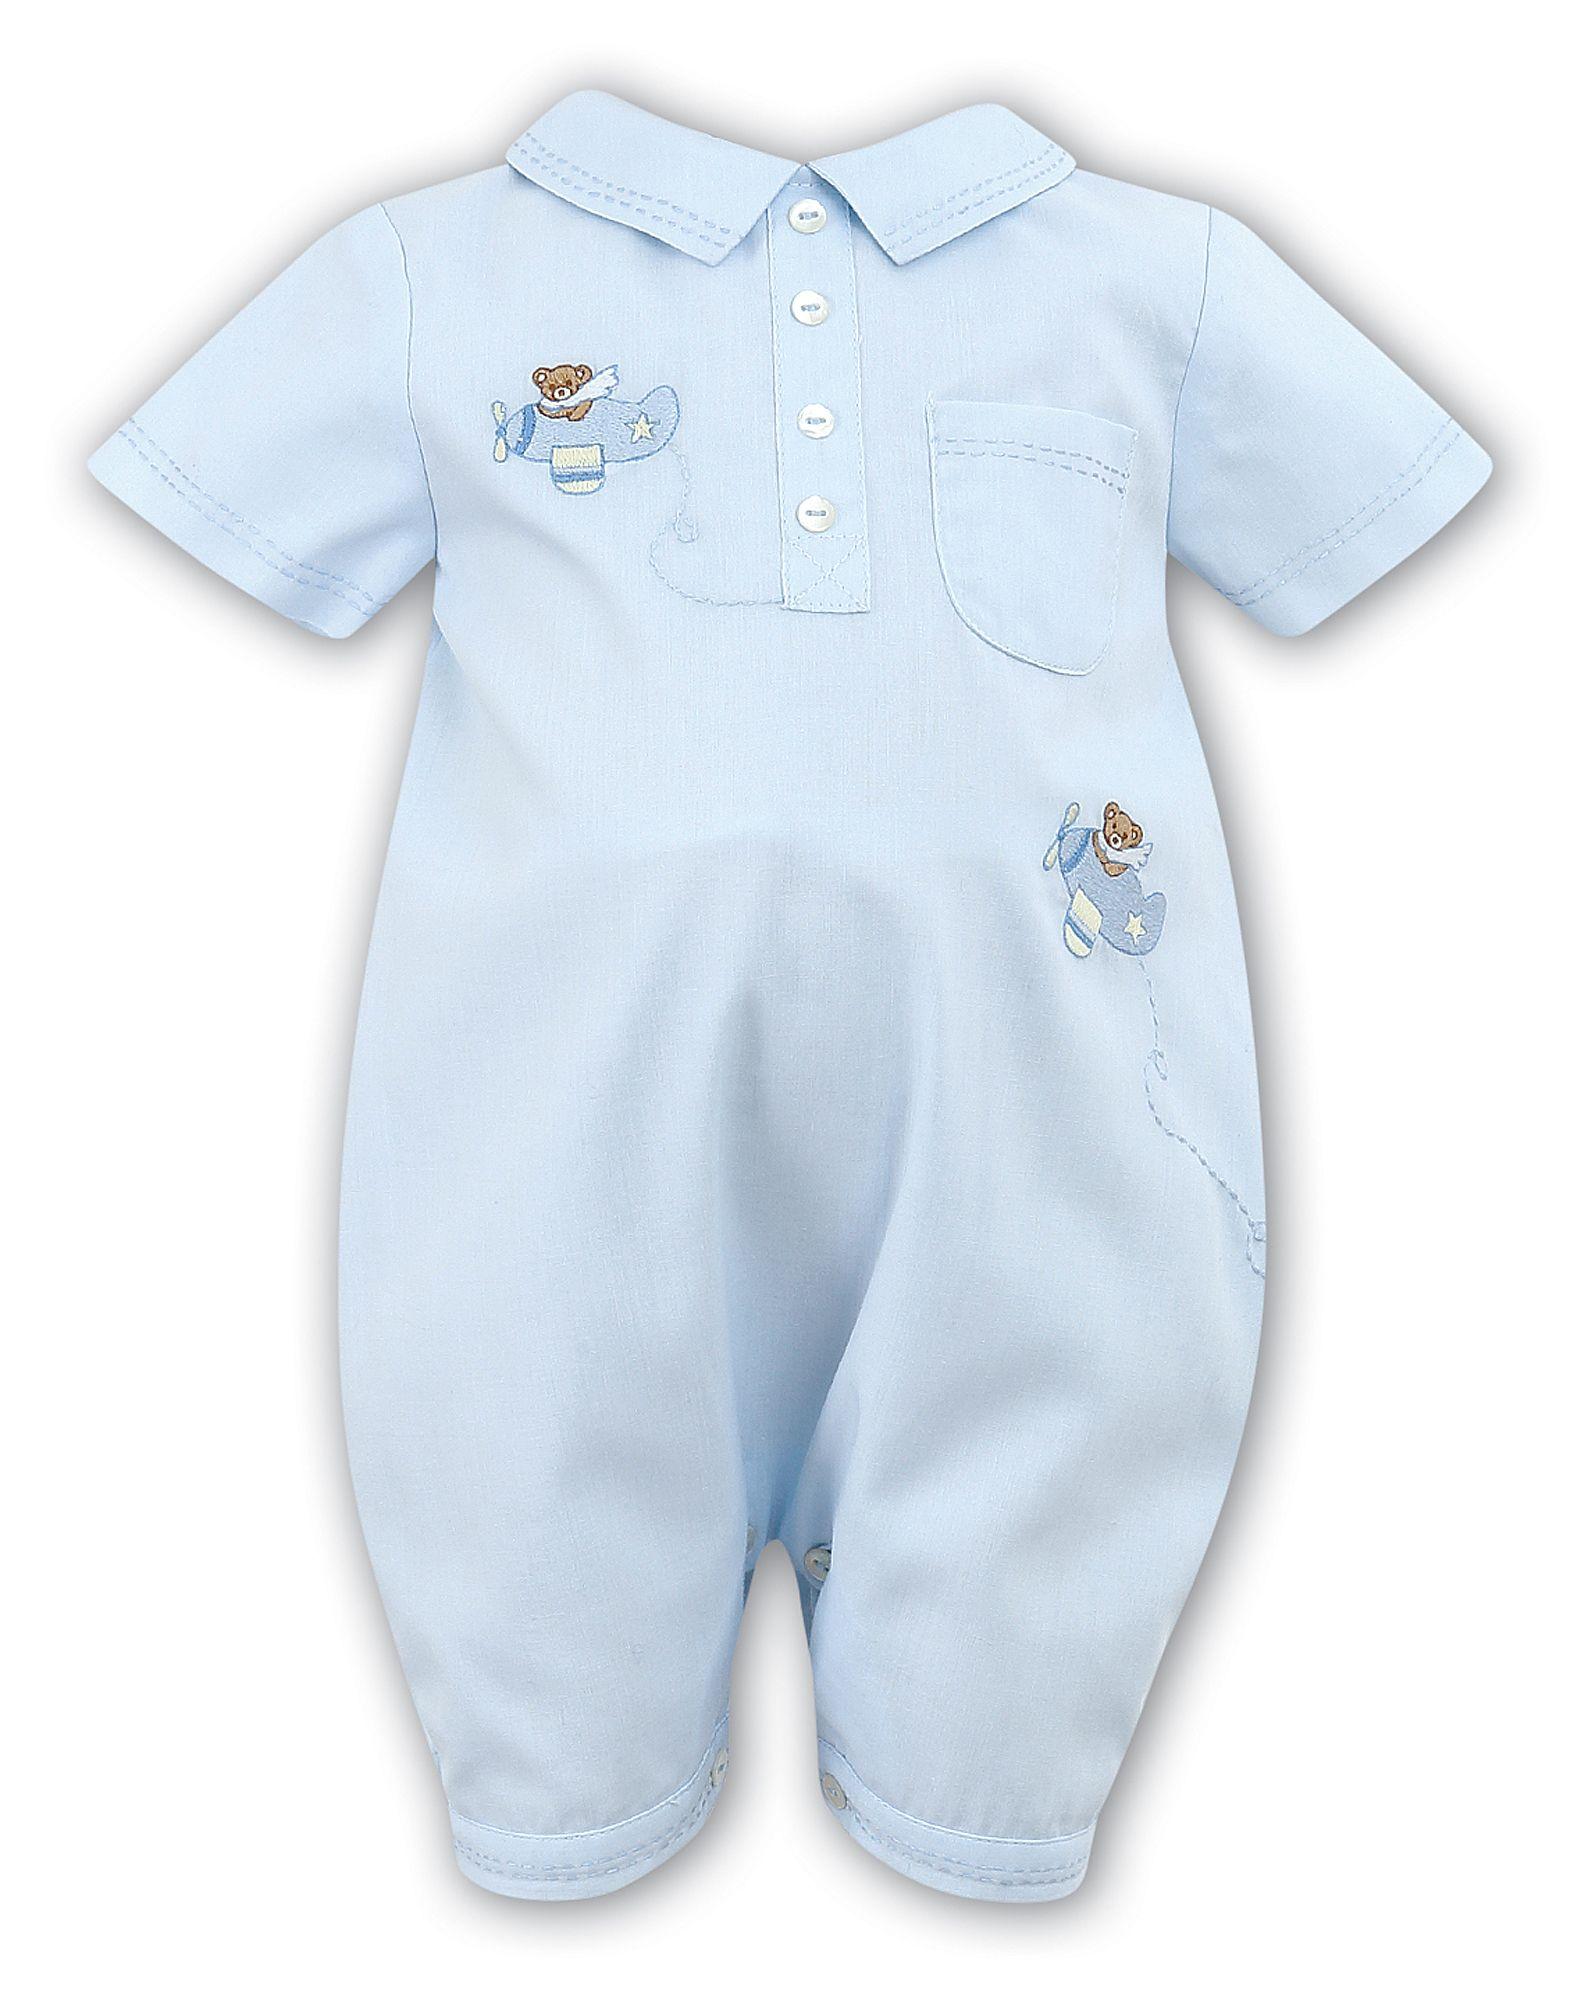 Pin by Jo Oakes on Classic babywear garments  cc218abdedef